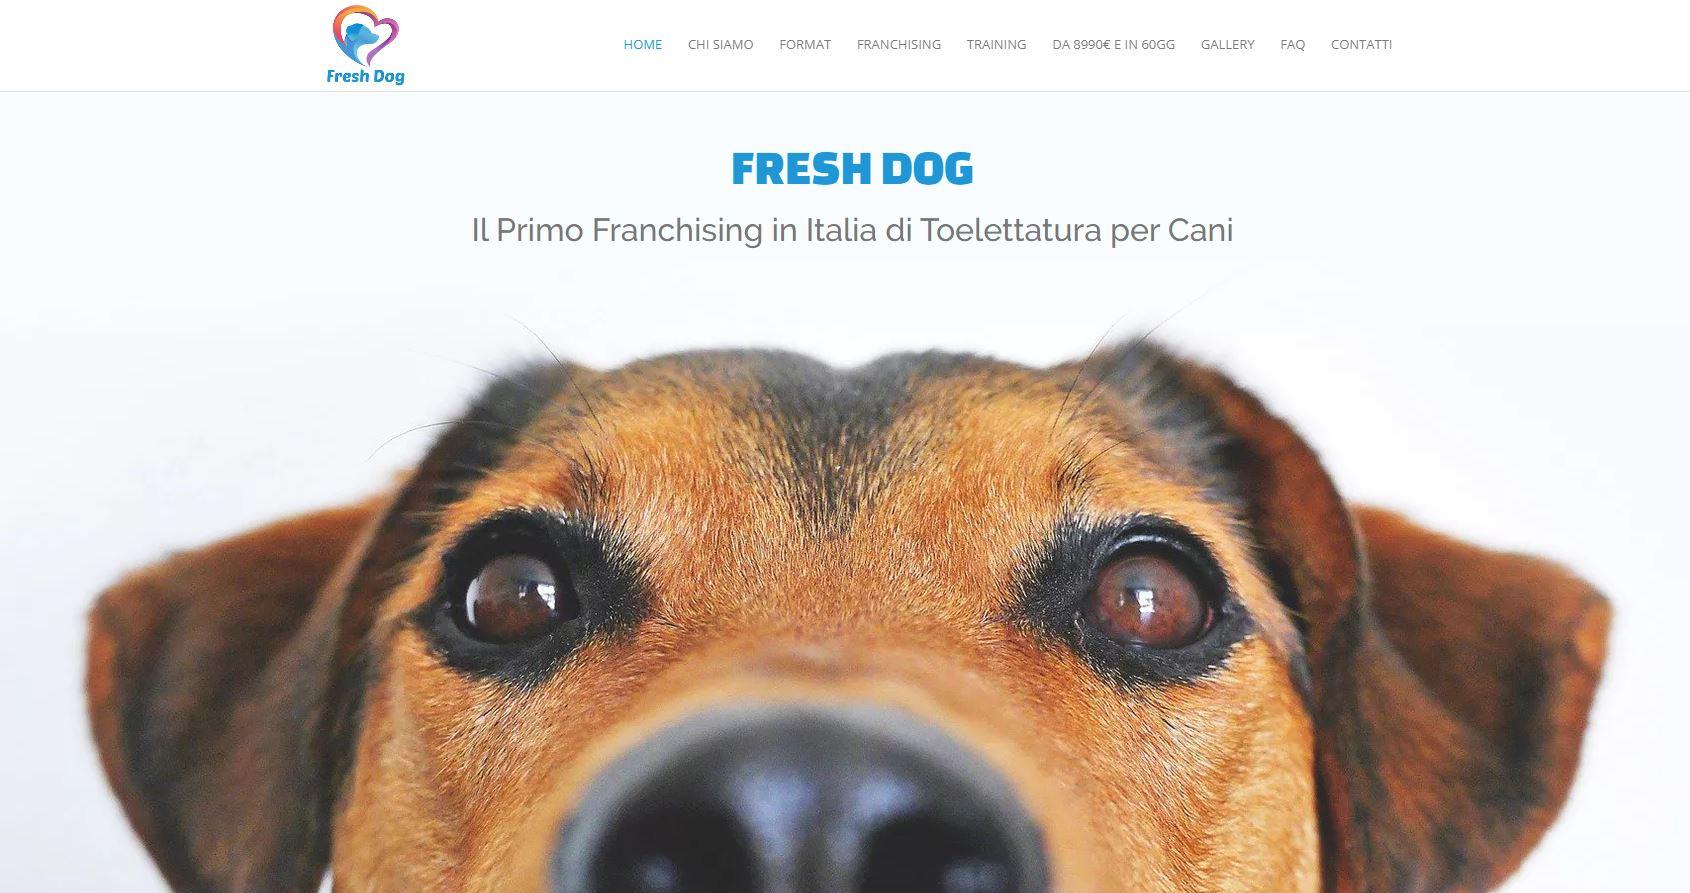 Fresh Dog toelettatura cani franchising